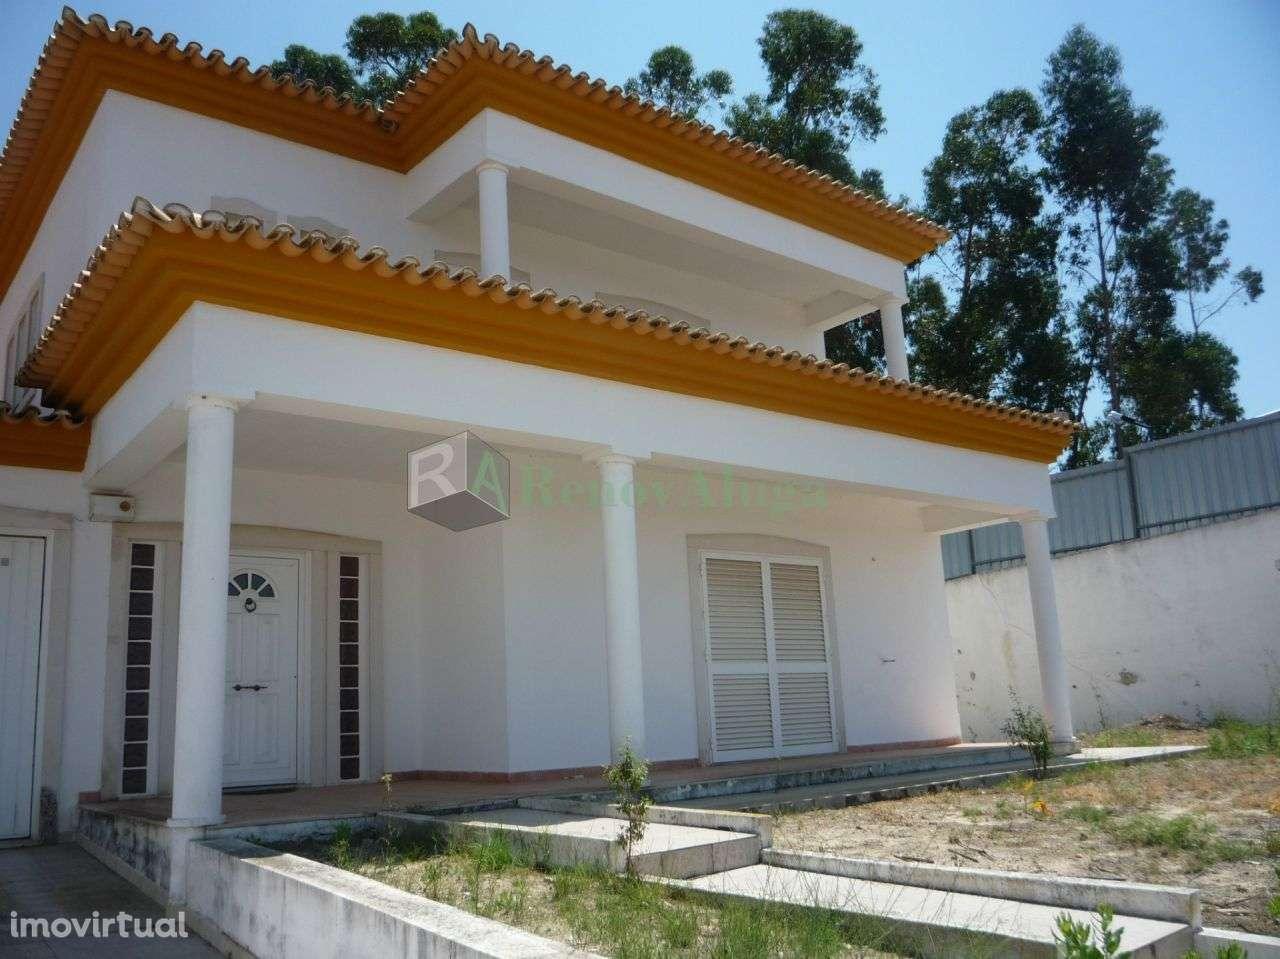 Moradia para arrendar, Quinta do Anjo, Setúbal - Foto 3